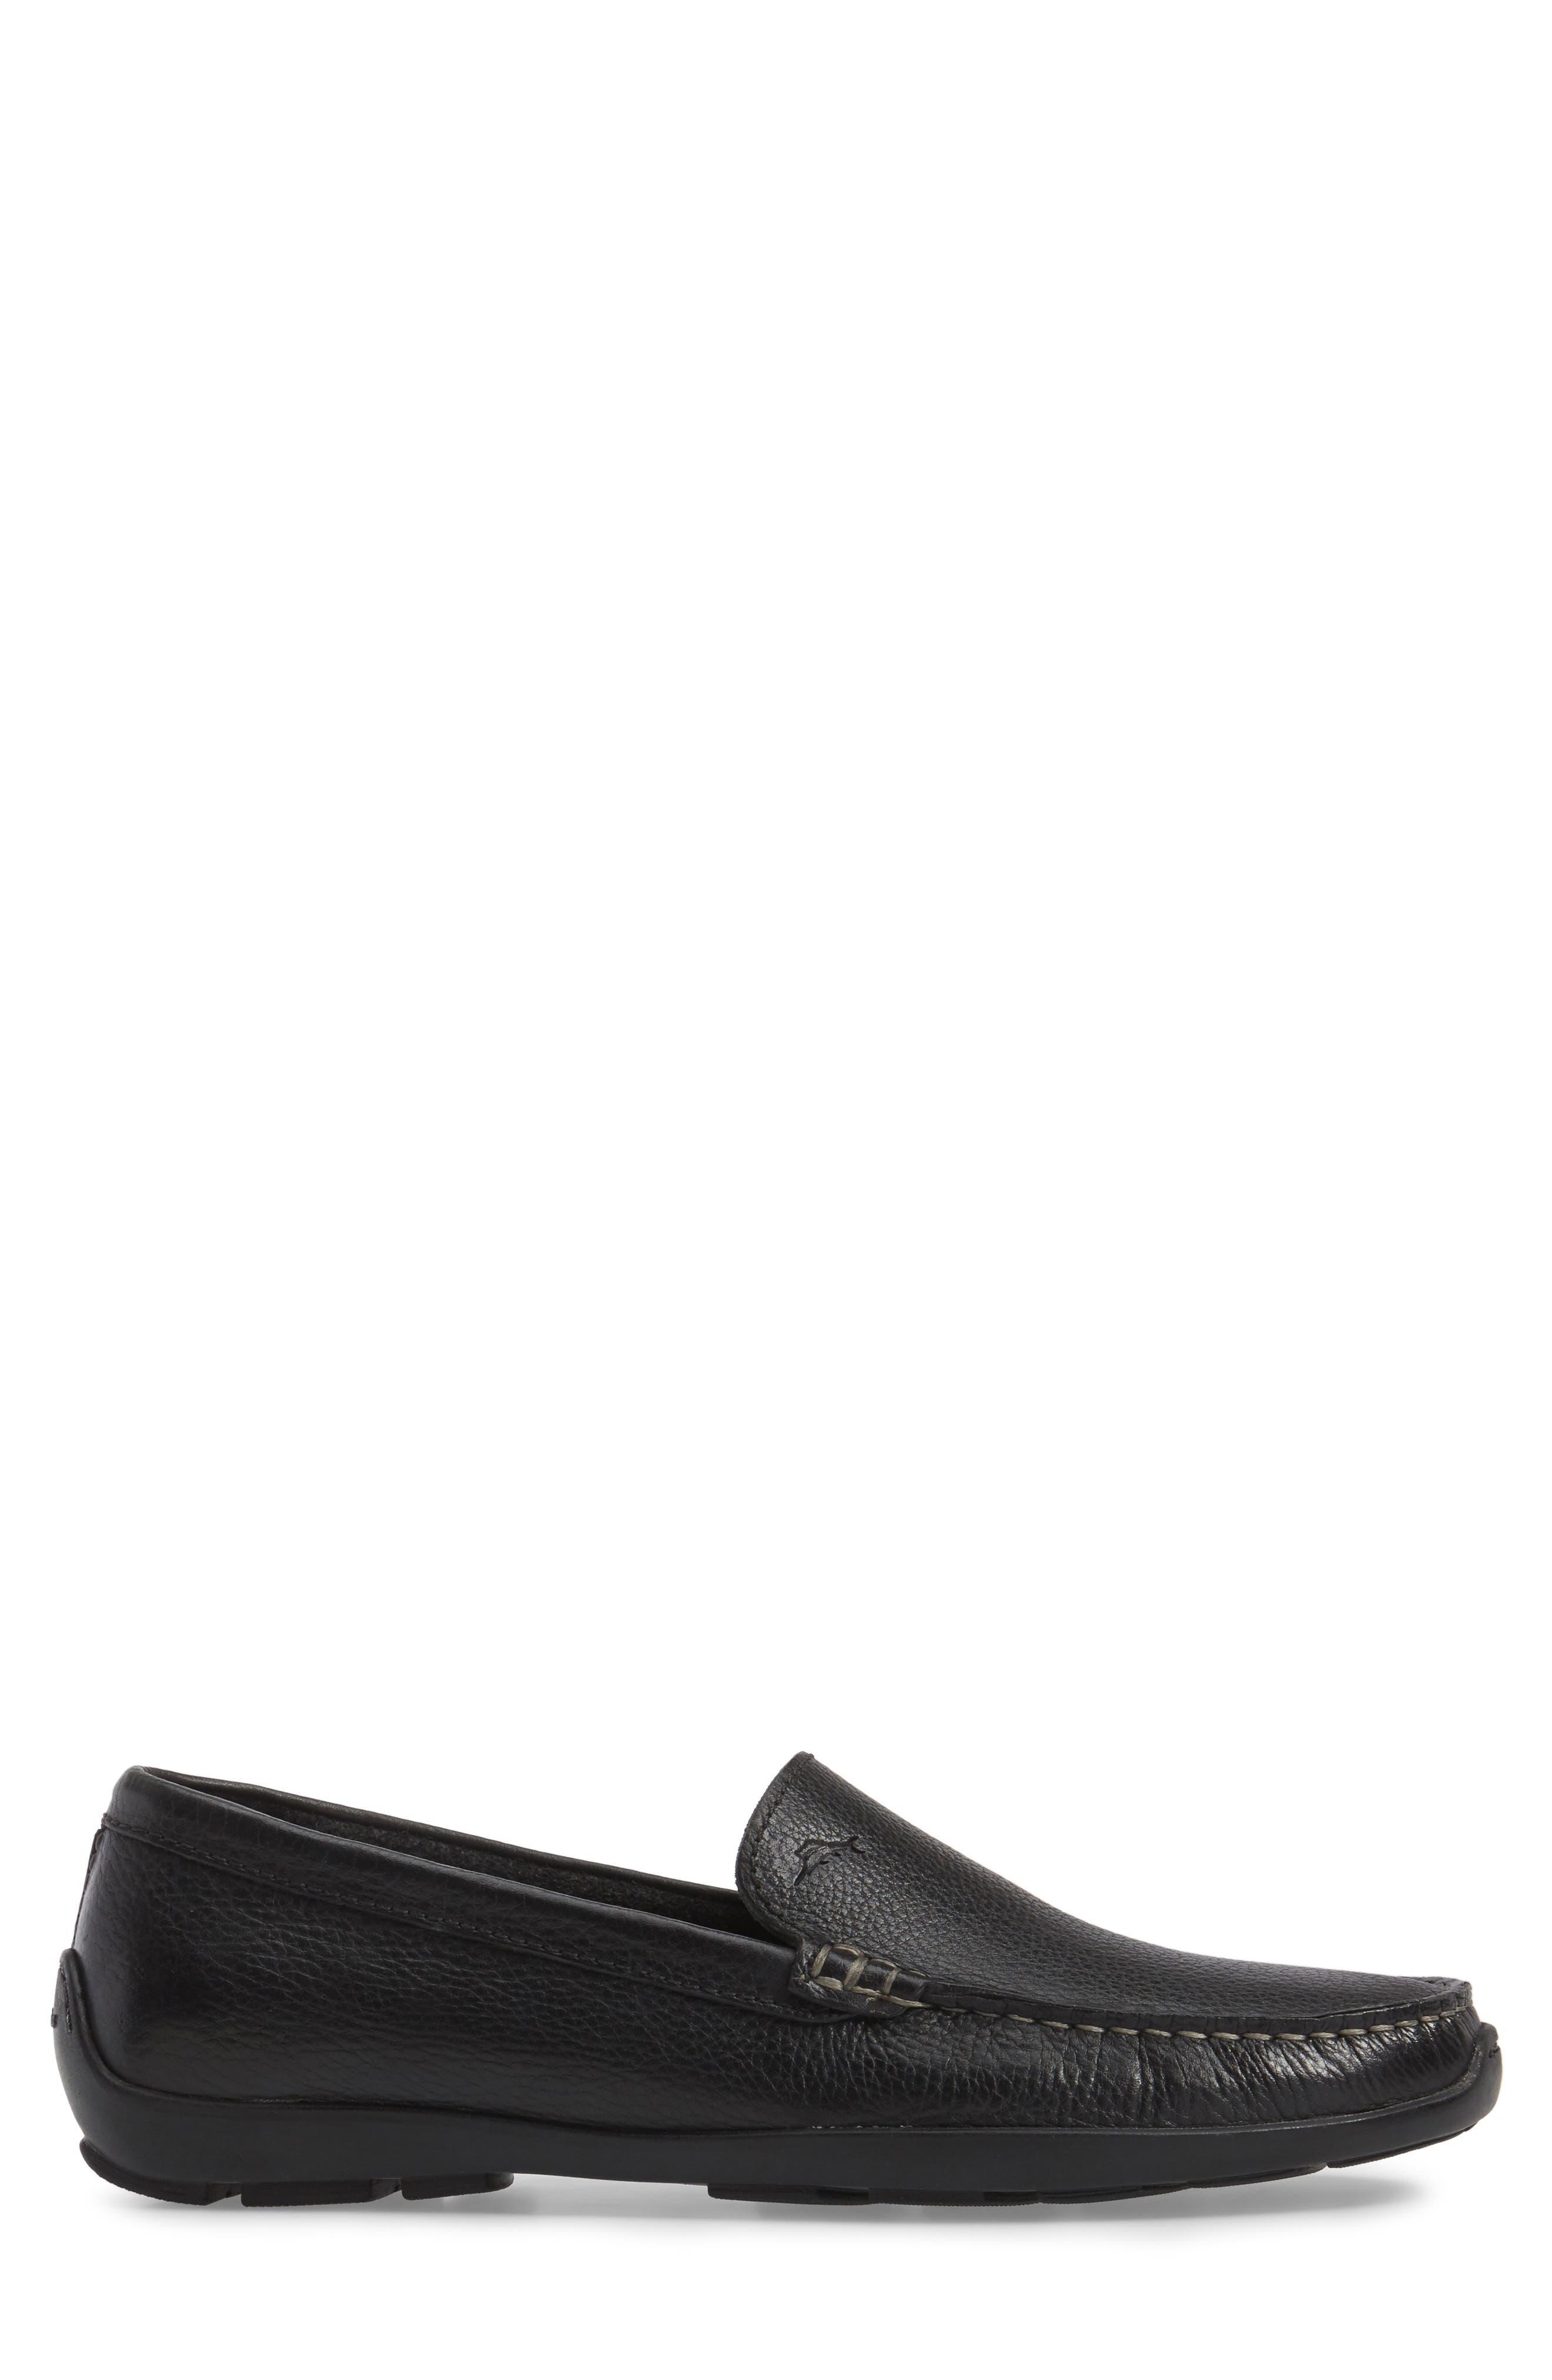 Orion Venetian Loafer,                             Alternate thumbnail 3, color,                             BLACK LEATHER